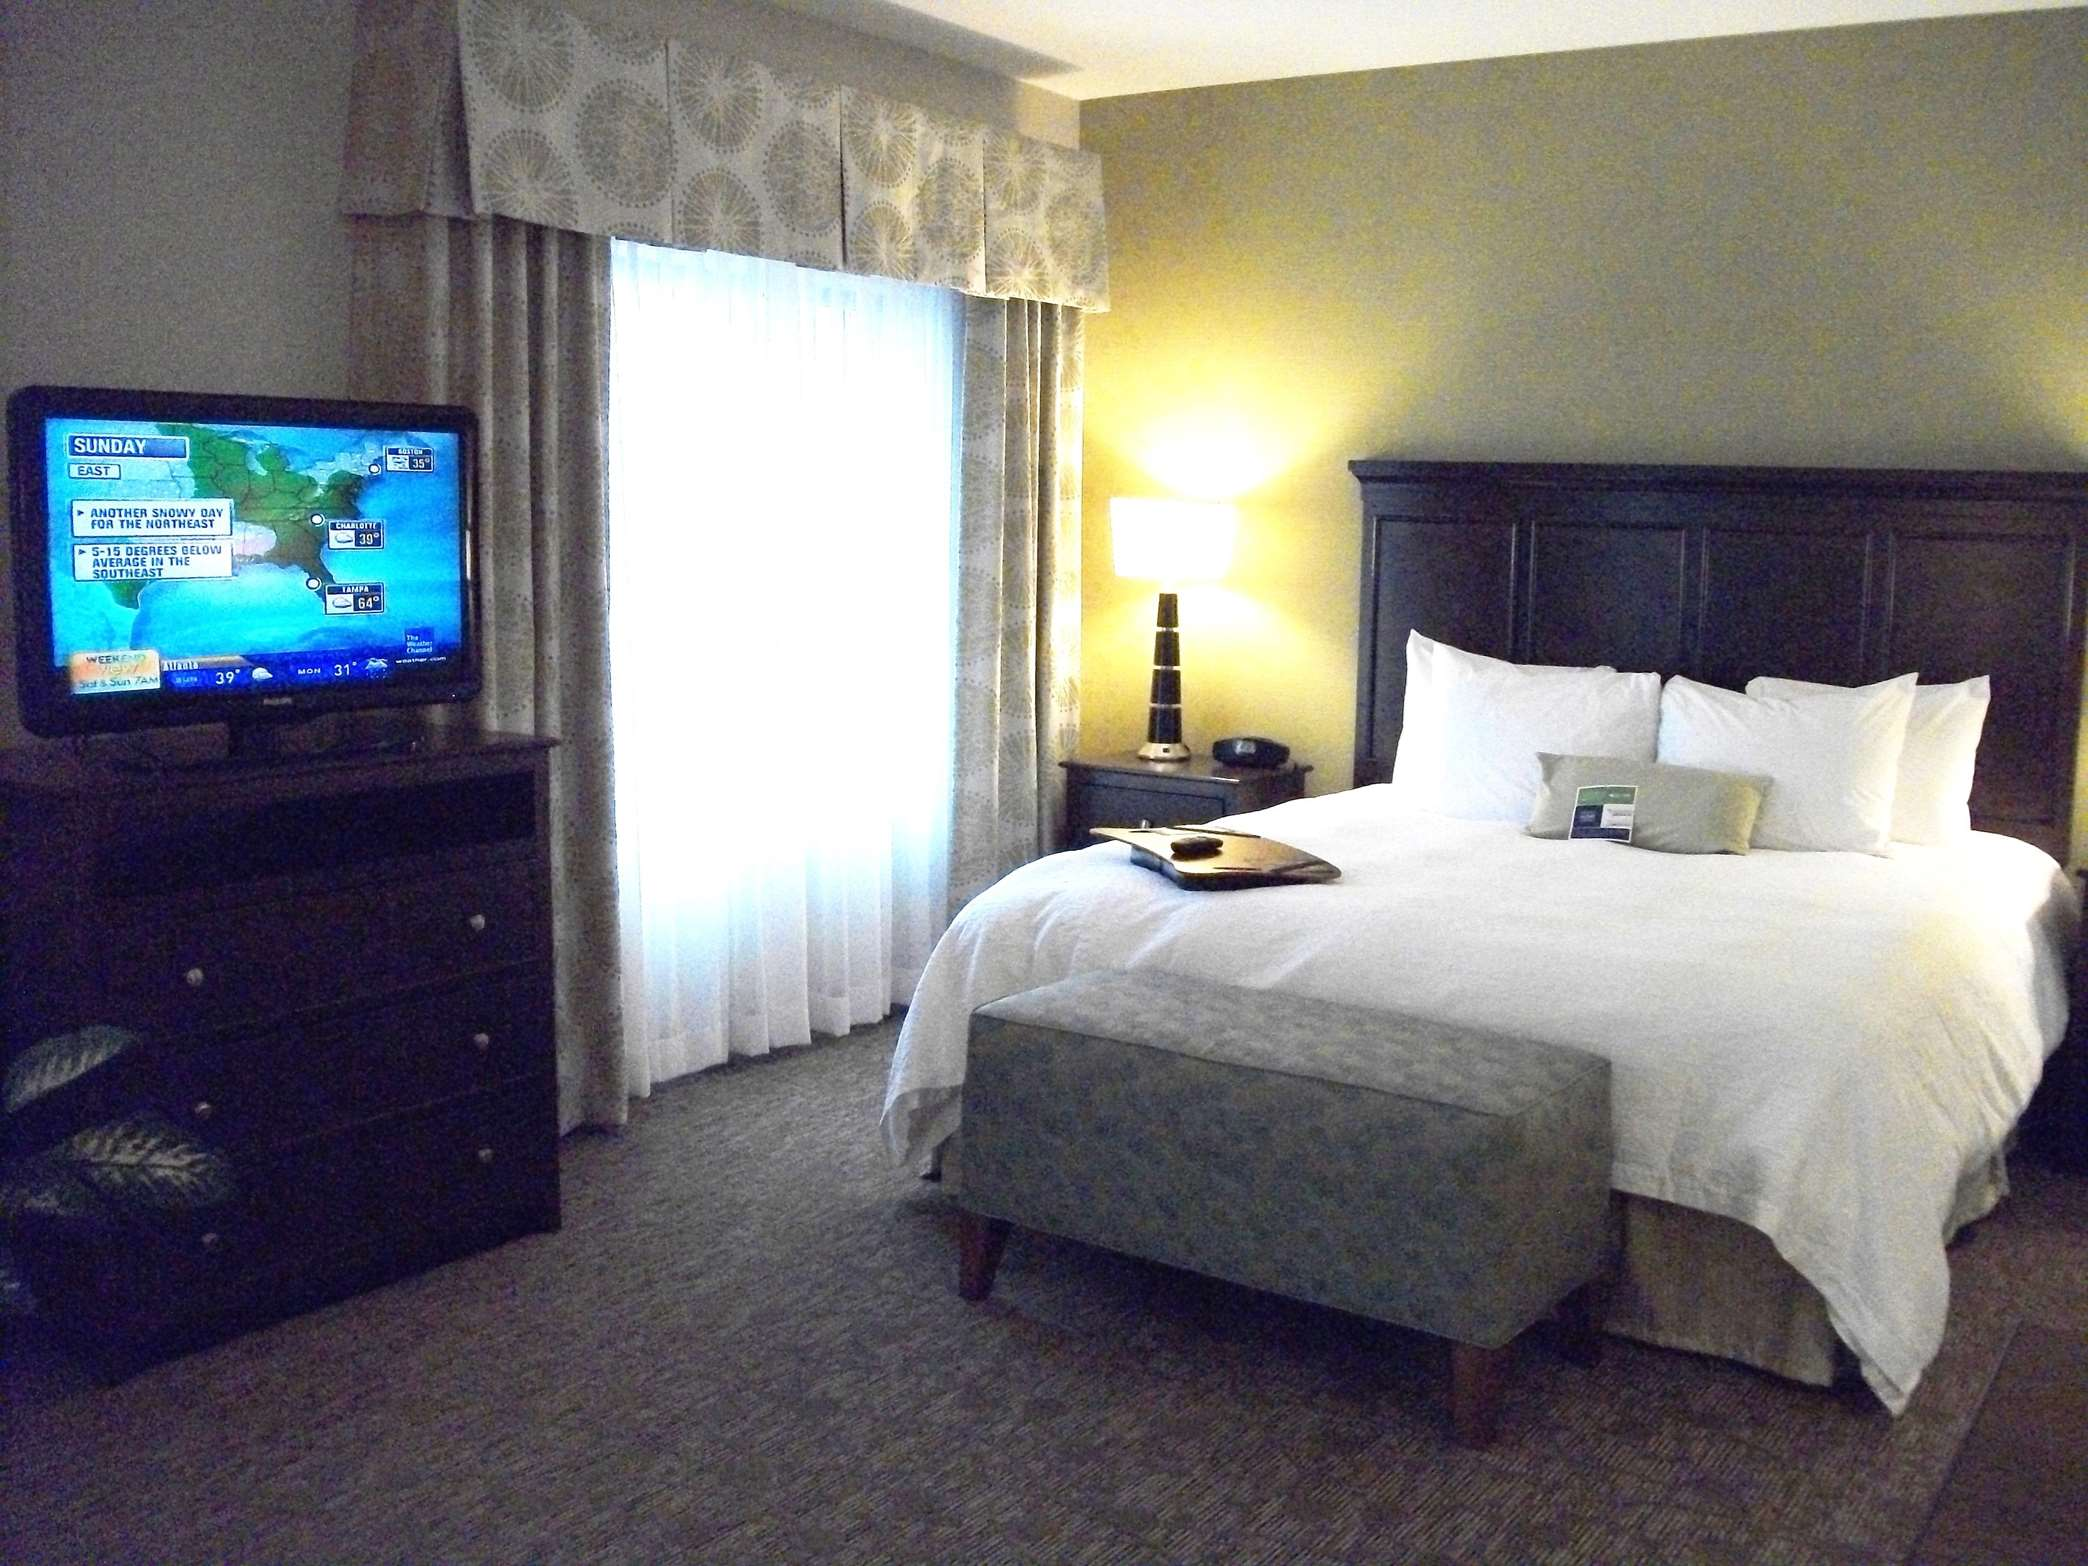 Hampton Inn & Suites Manteca image 18